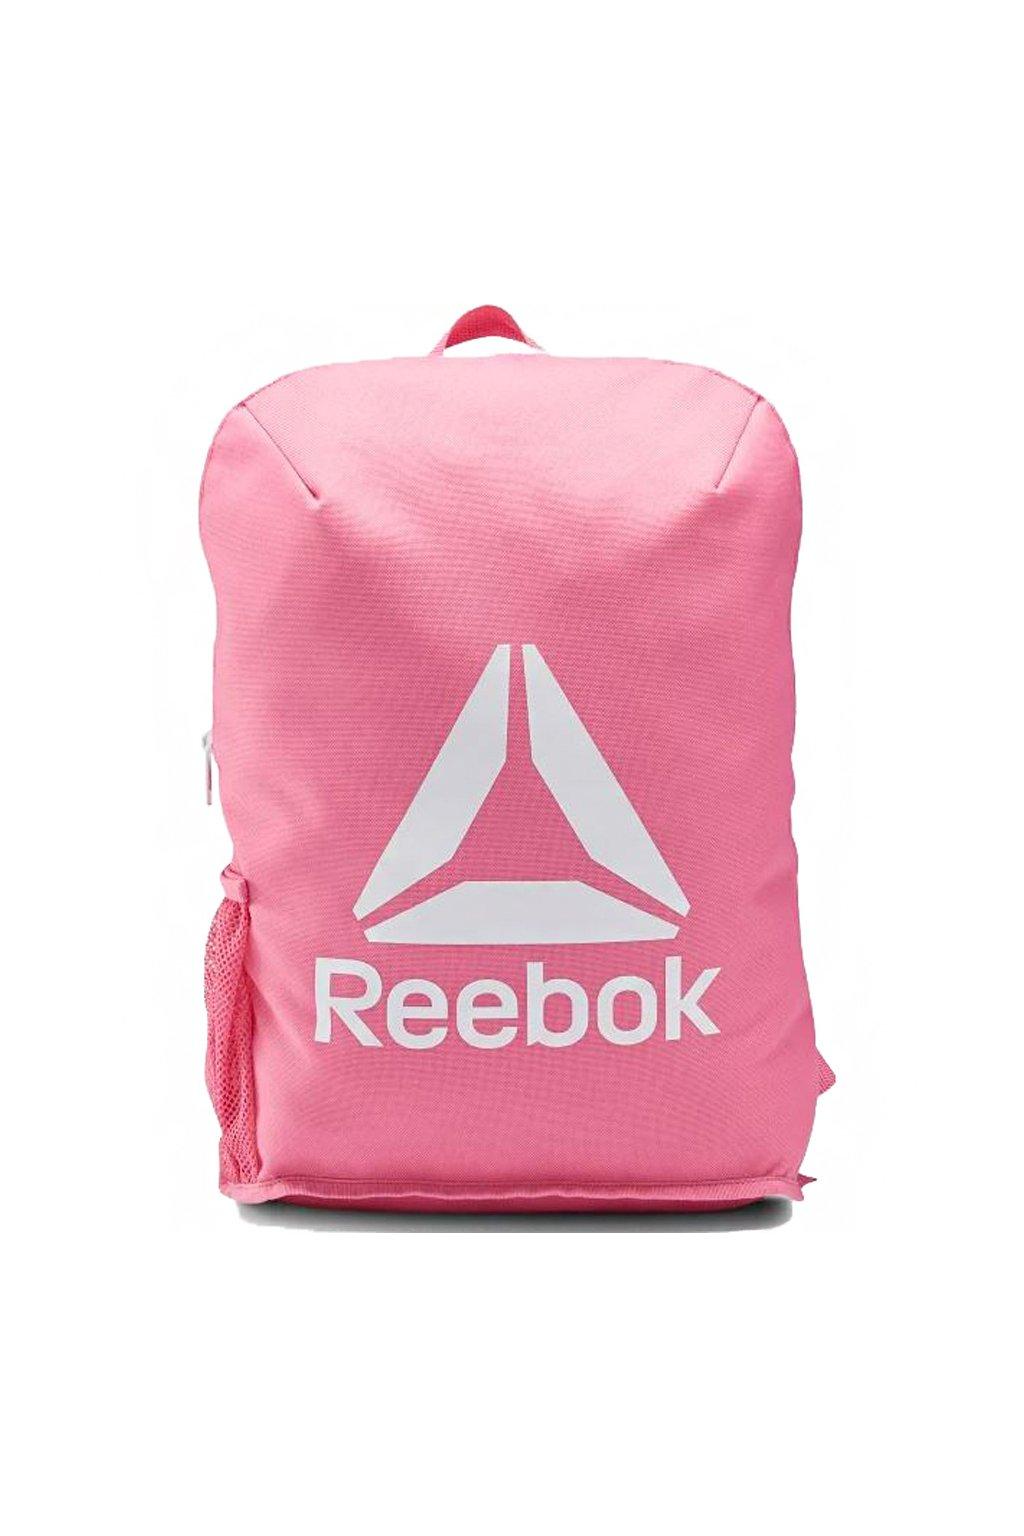 Batoh Reebok Active Core Backpack S EC5522 ružový 16L